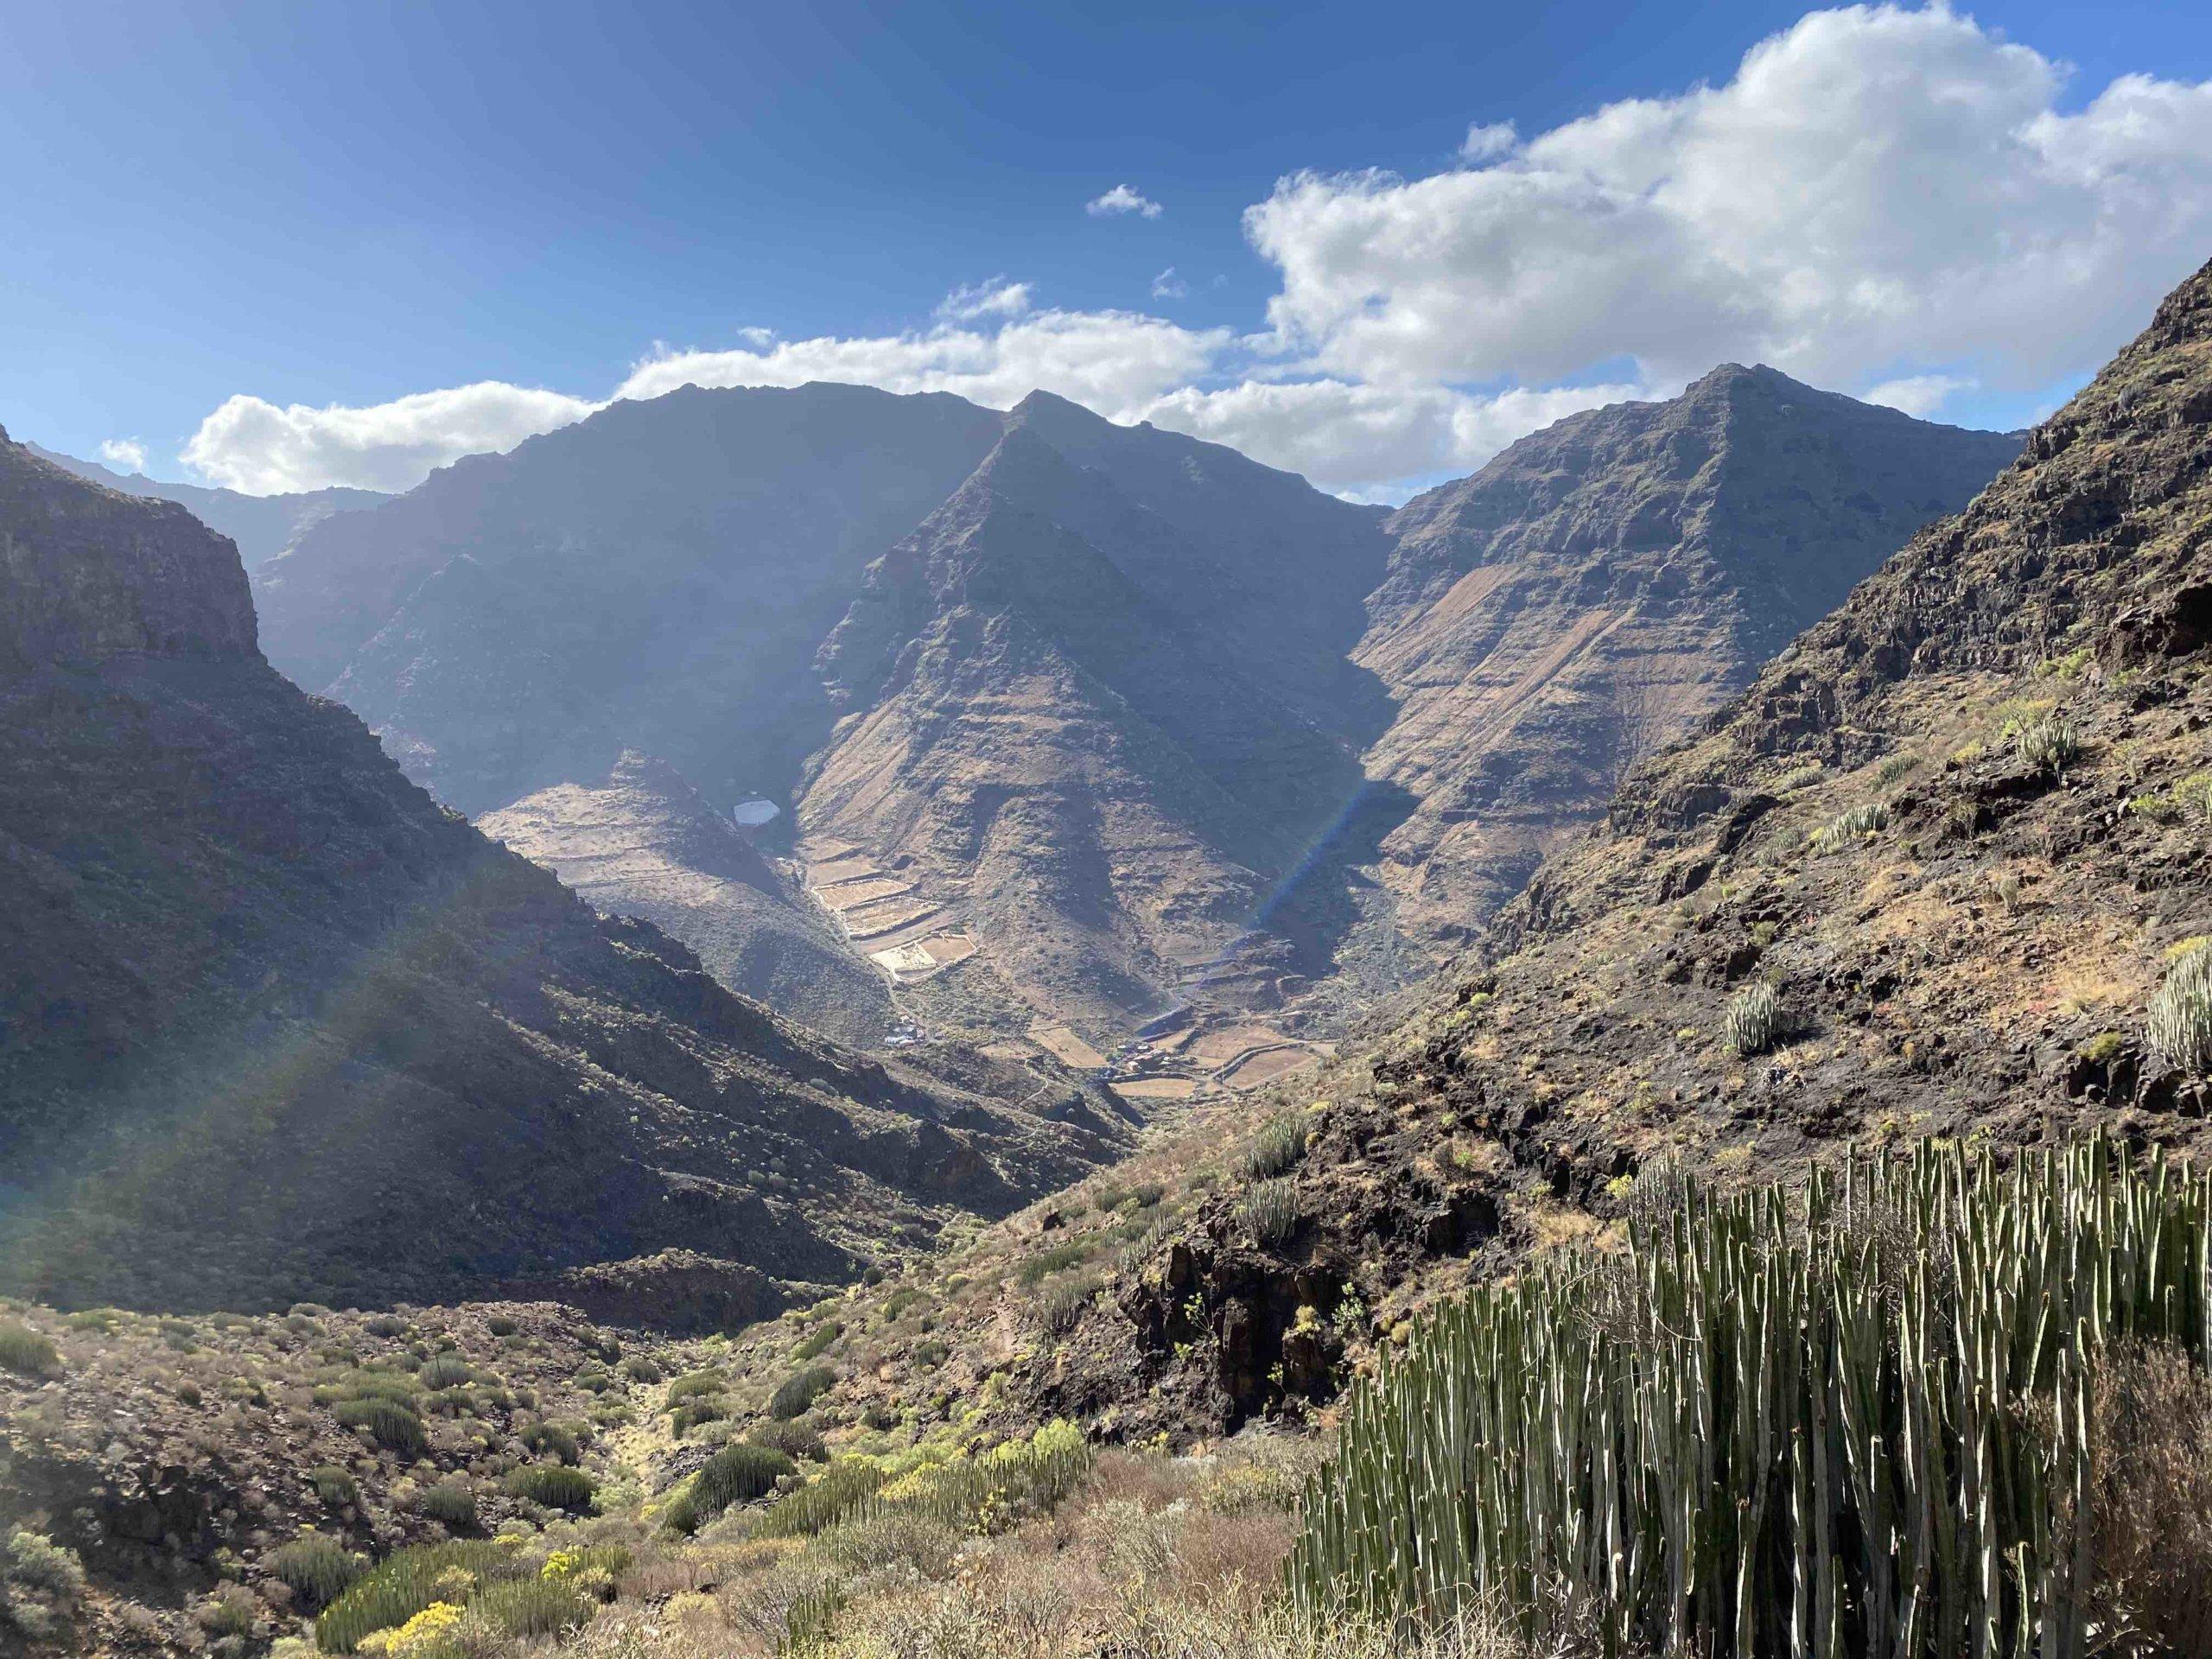 Tasartico, Güi-güi, Gran Canaria